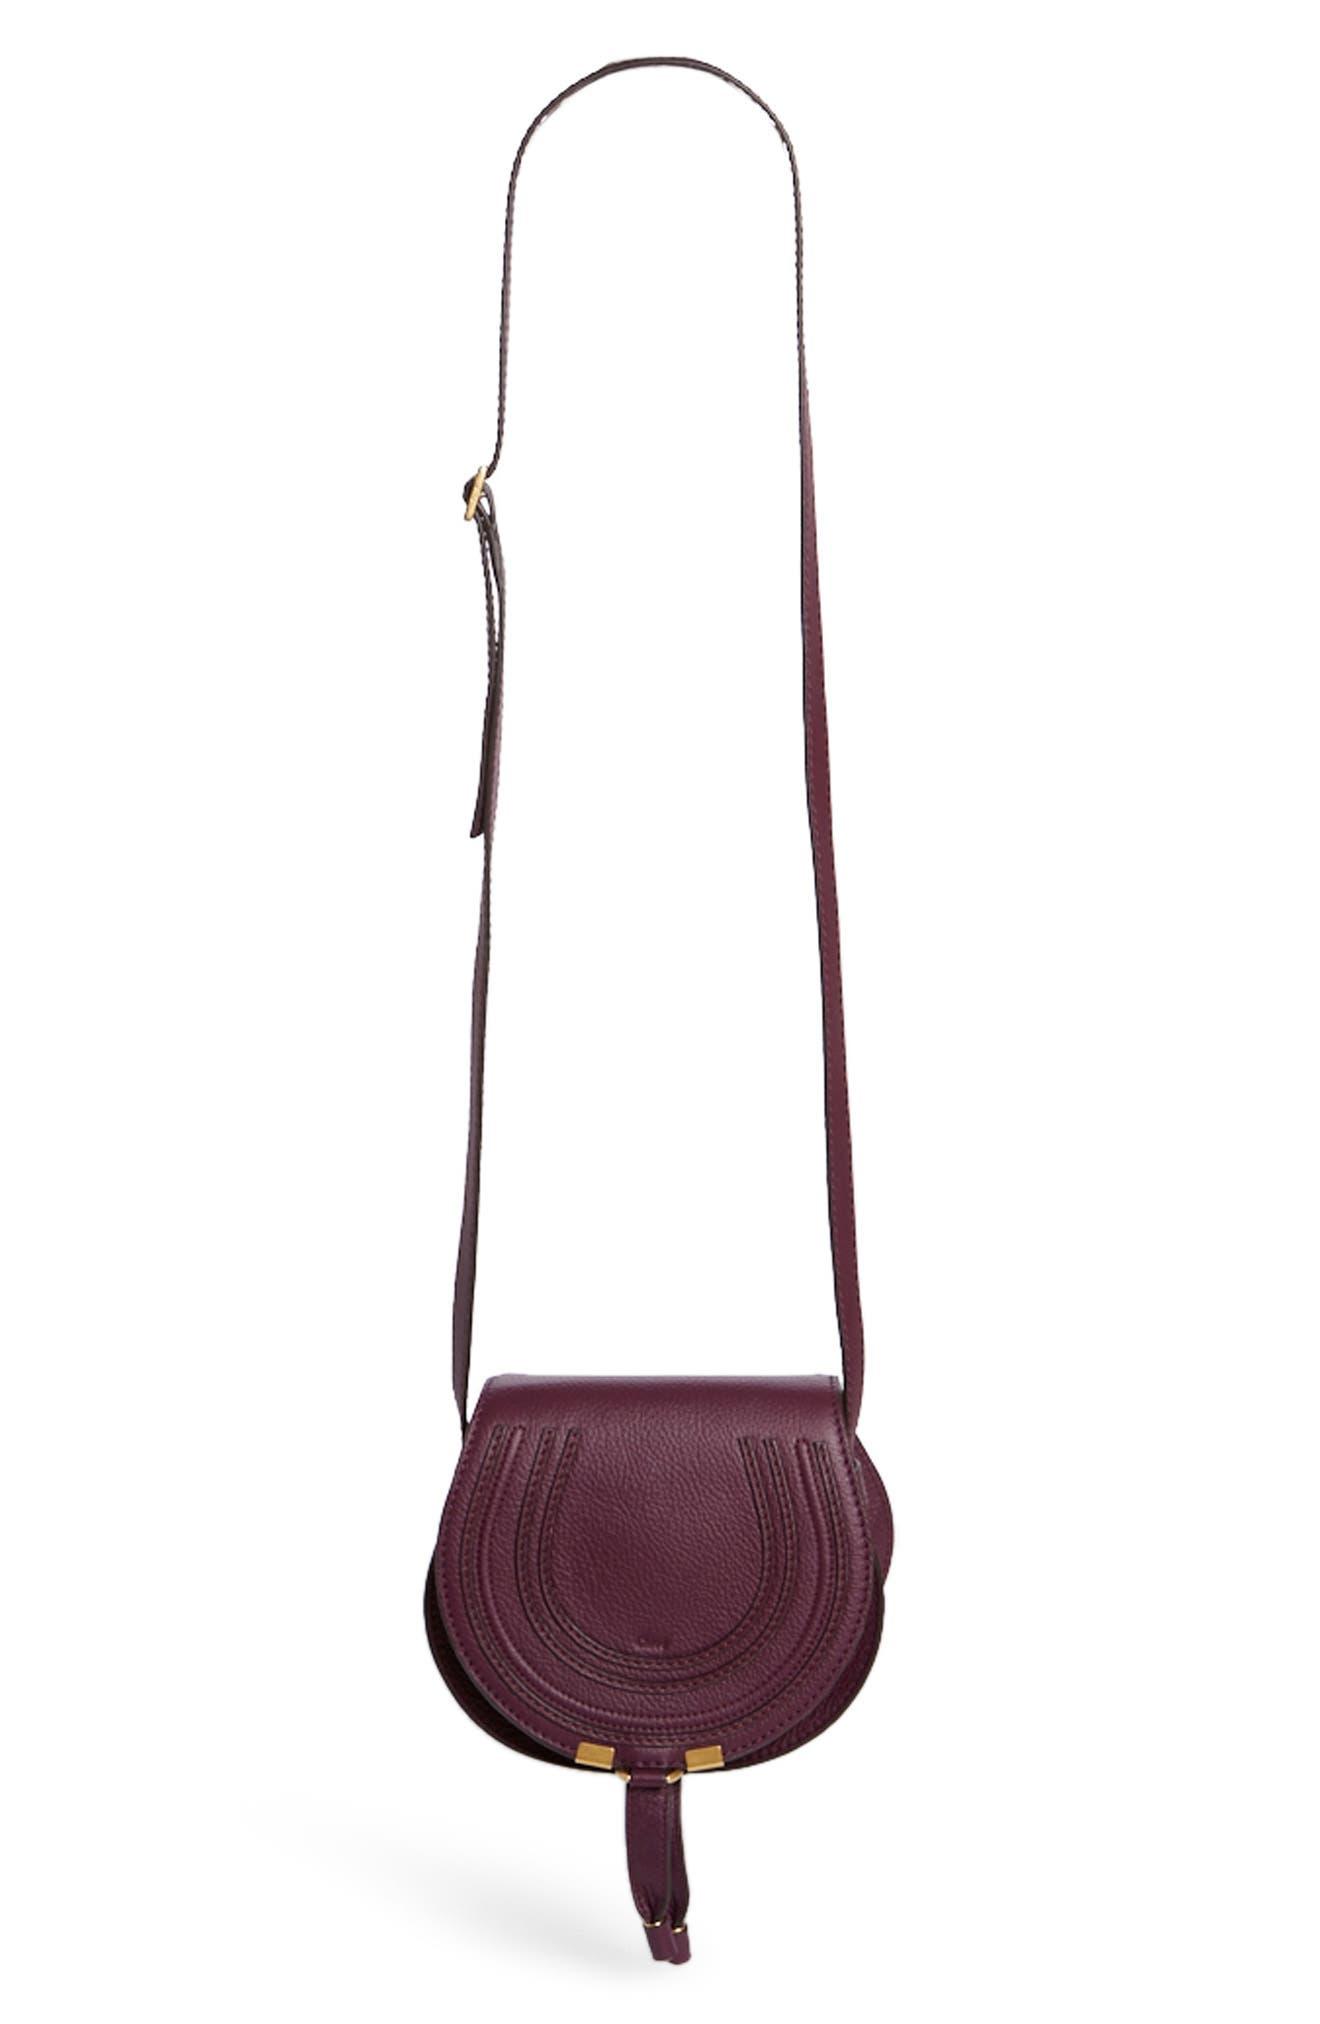 Main Image - Chloé 'Mini Marcie' Leather Crossbody Bag